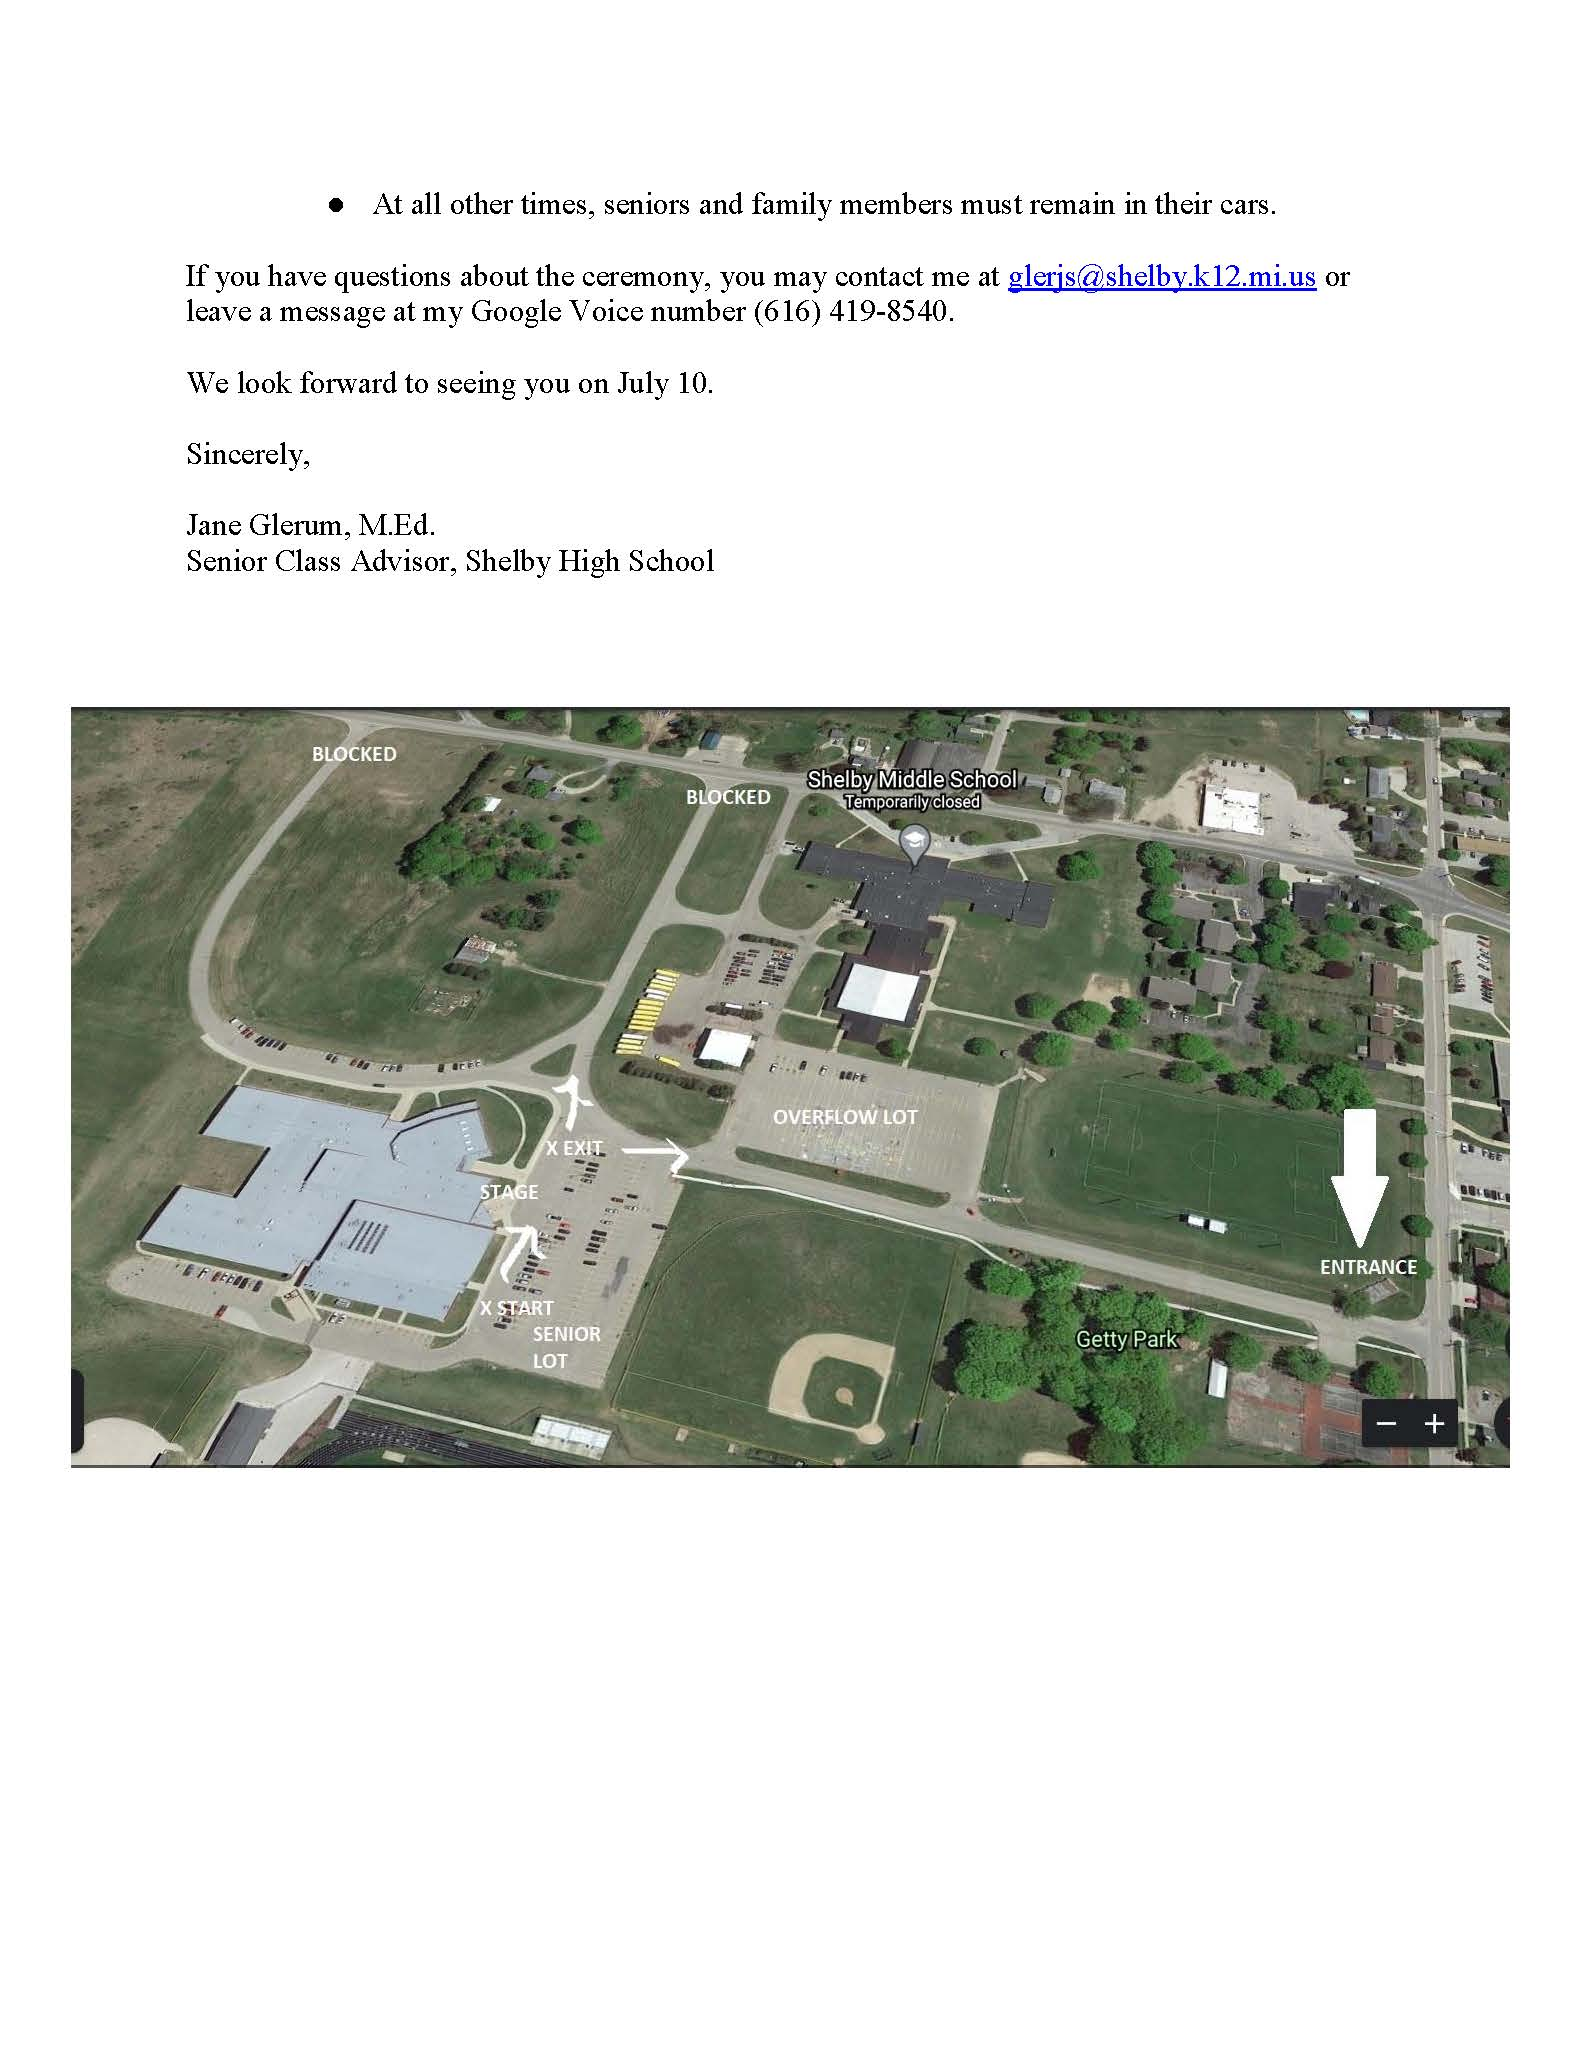 Letter Regarding Graduation